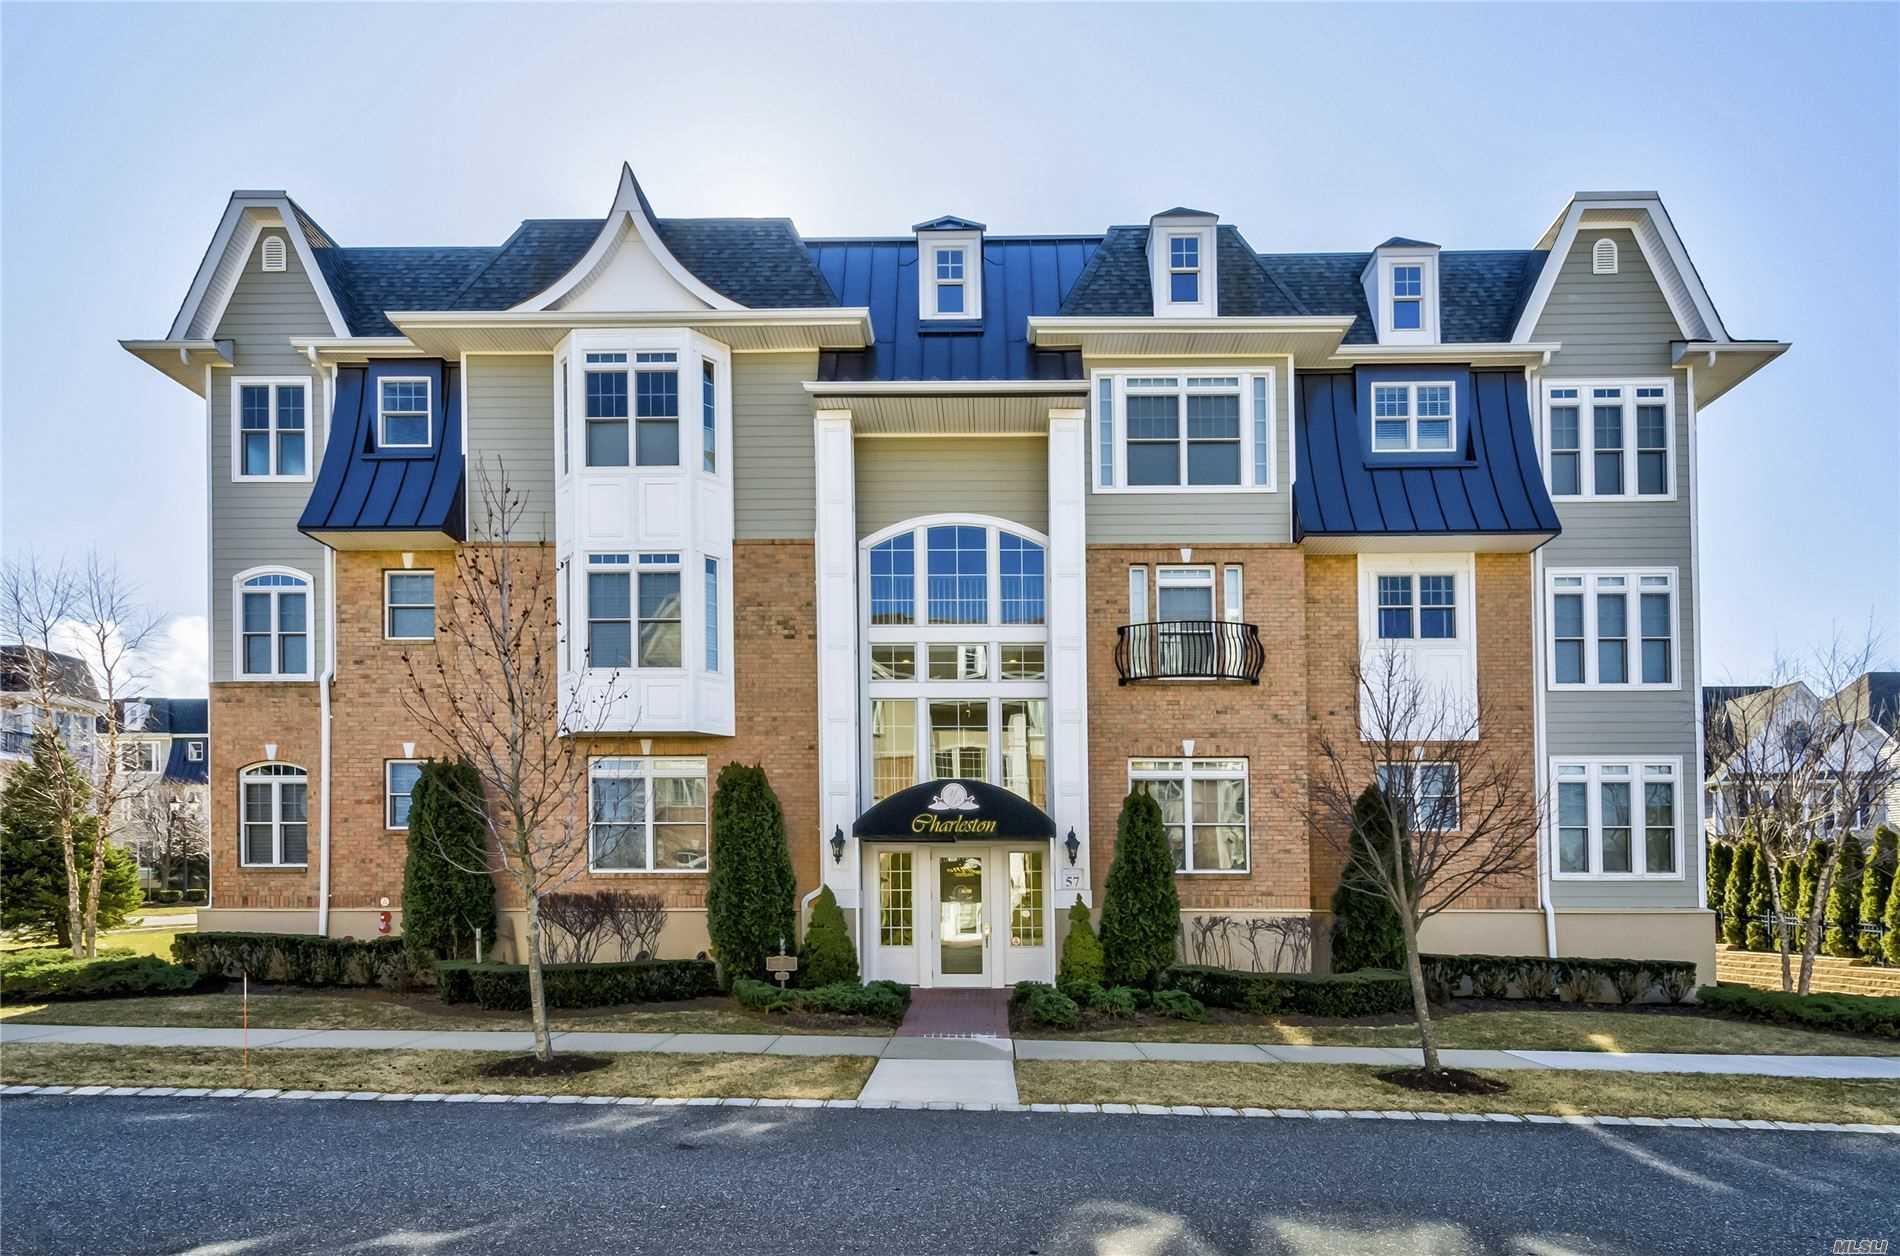 Property for sale at 378 Trotting Lane, Westbury NY 11590, Westbury,  New York 11590